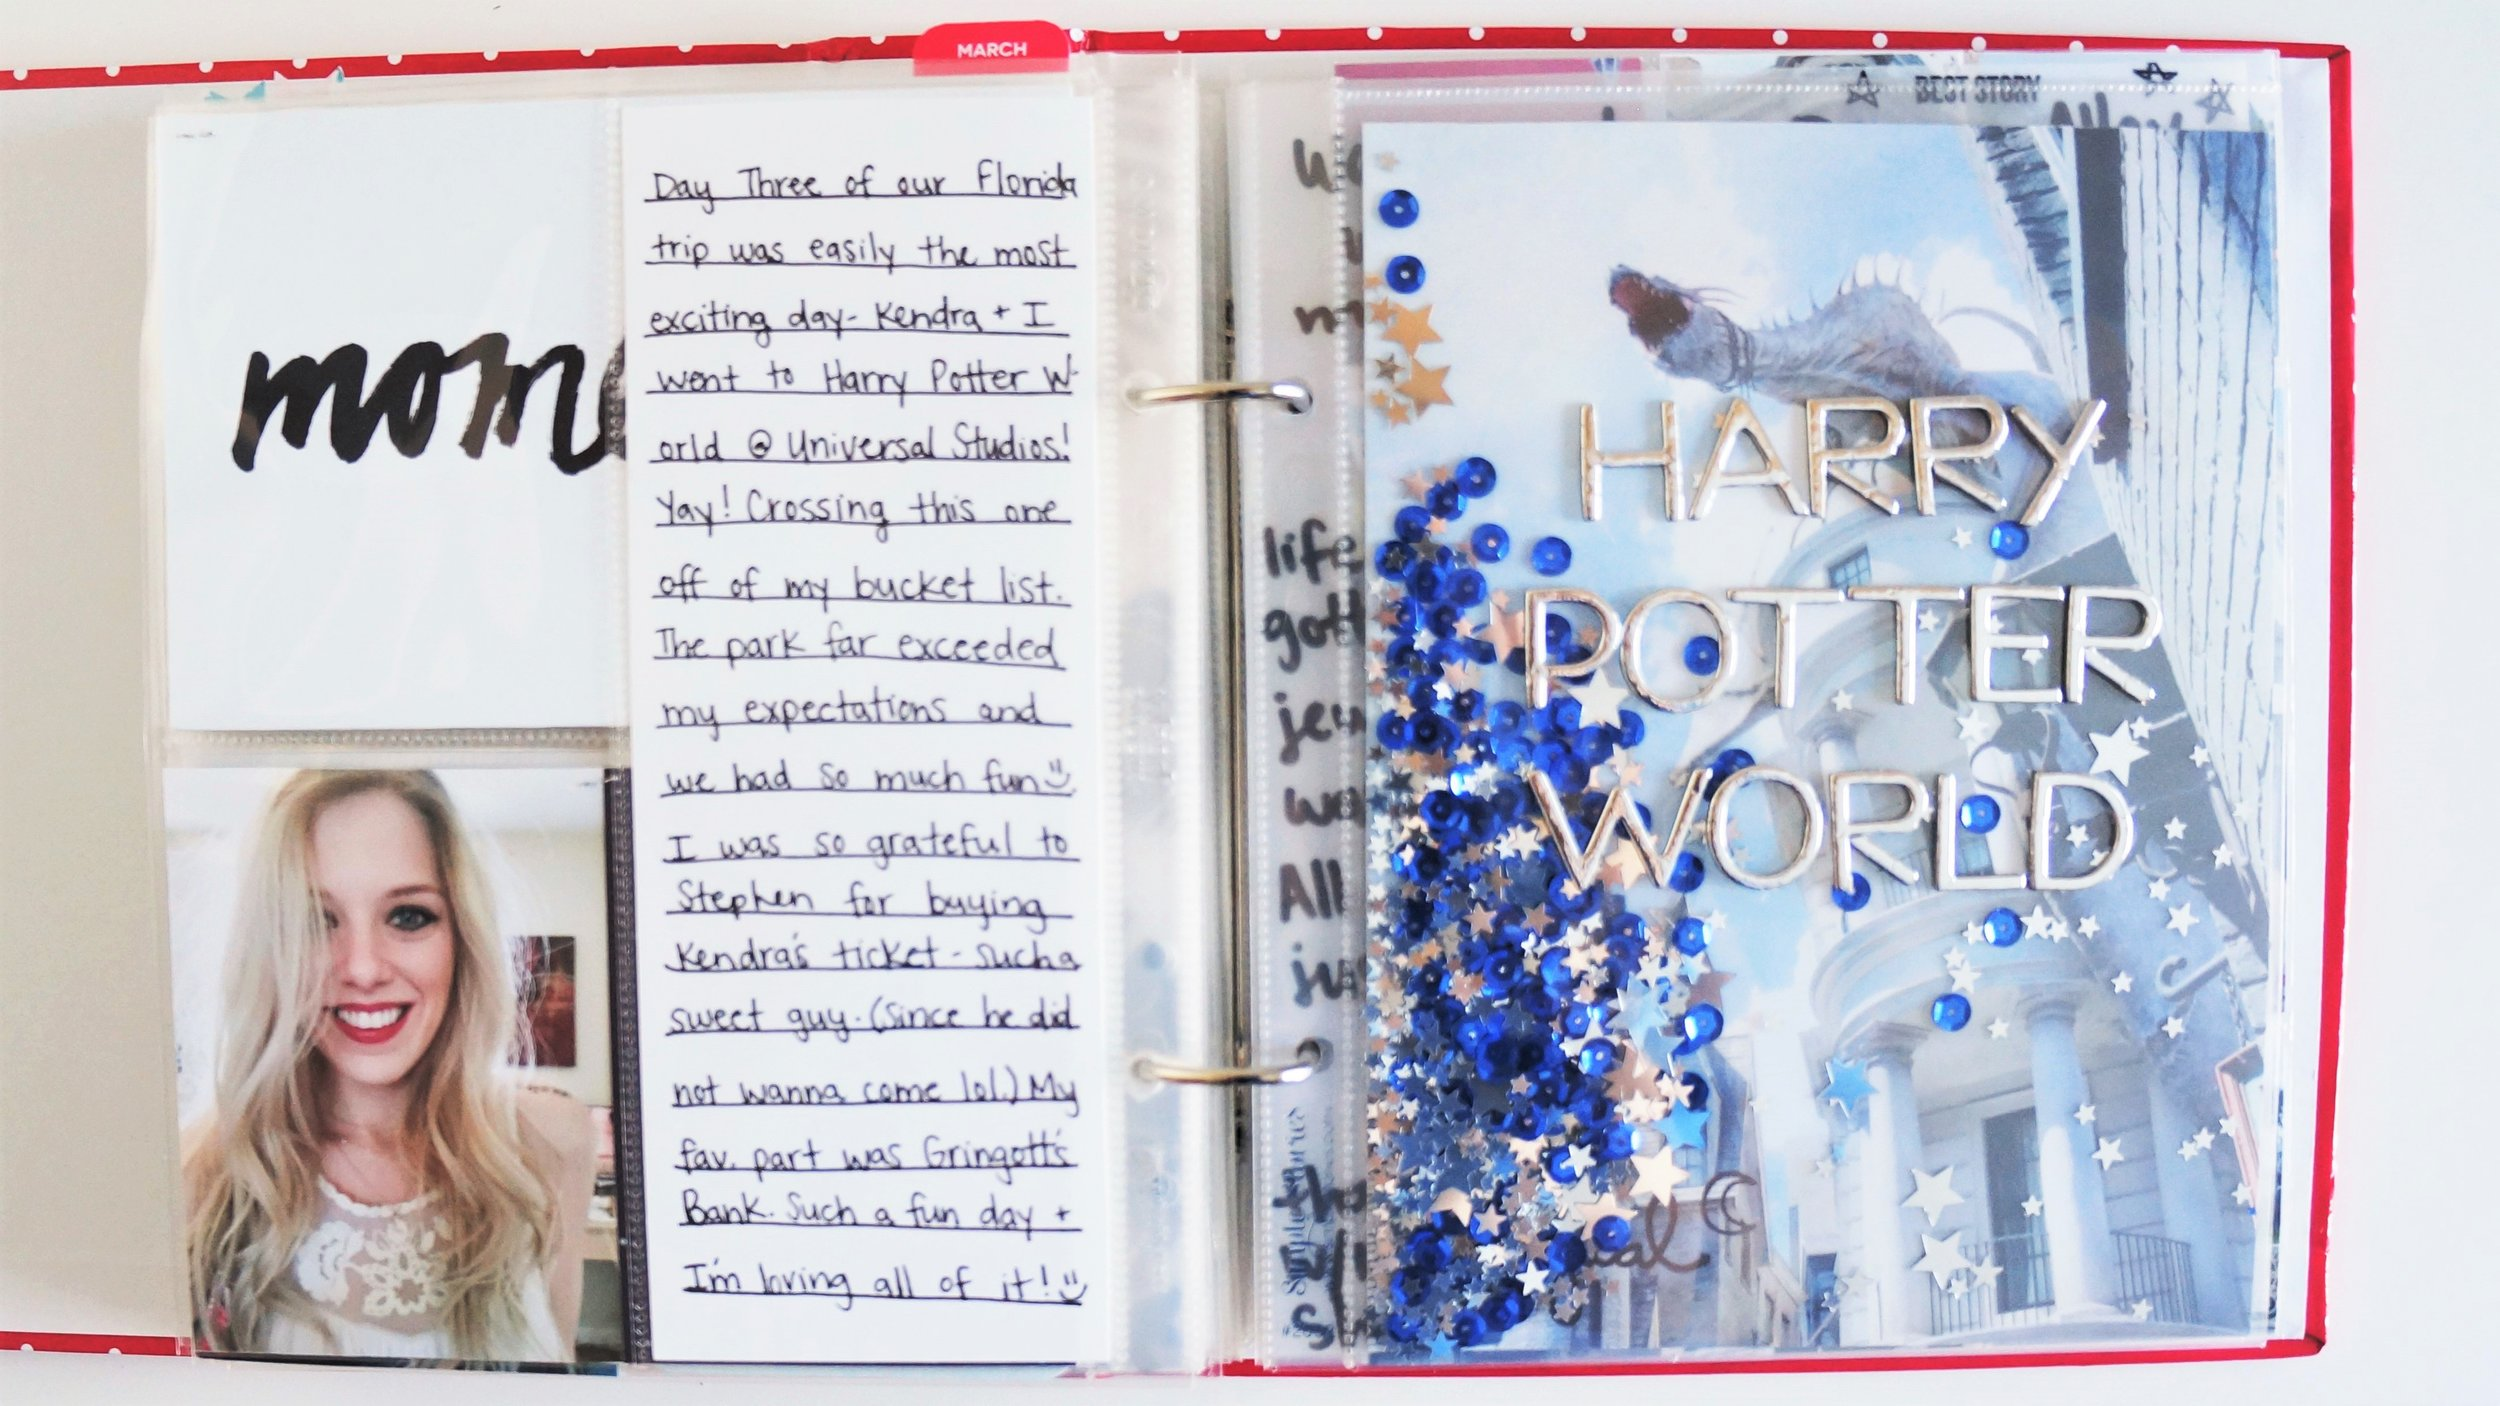 Harry Potter World MA (3).JPG